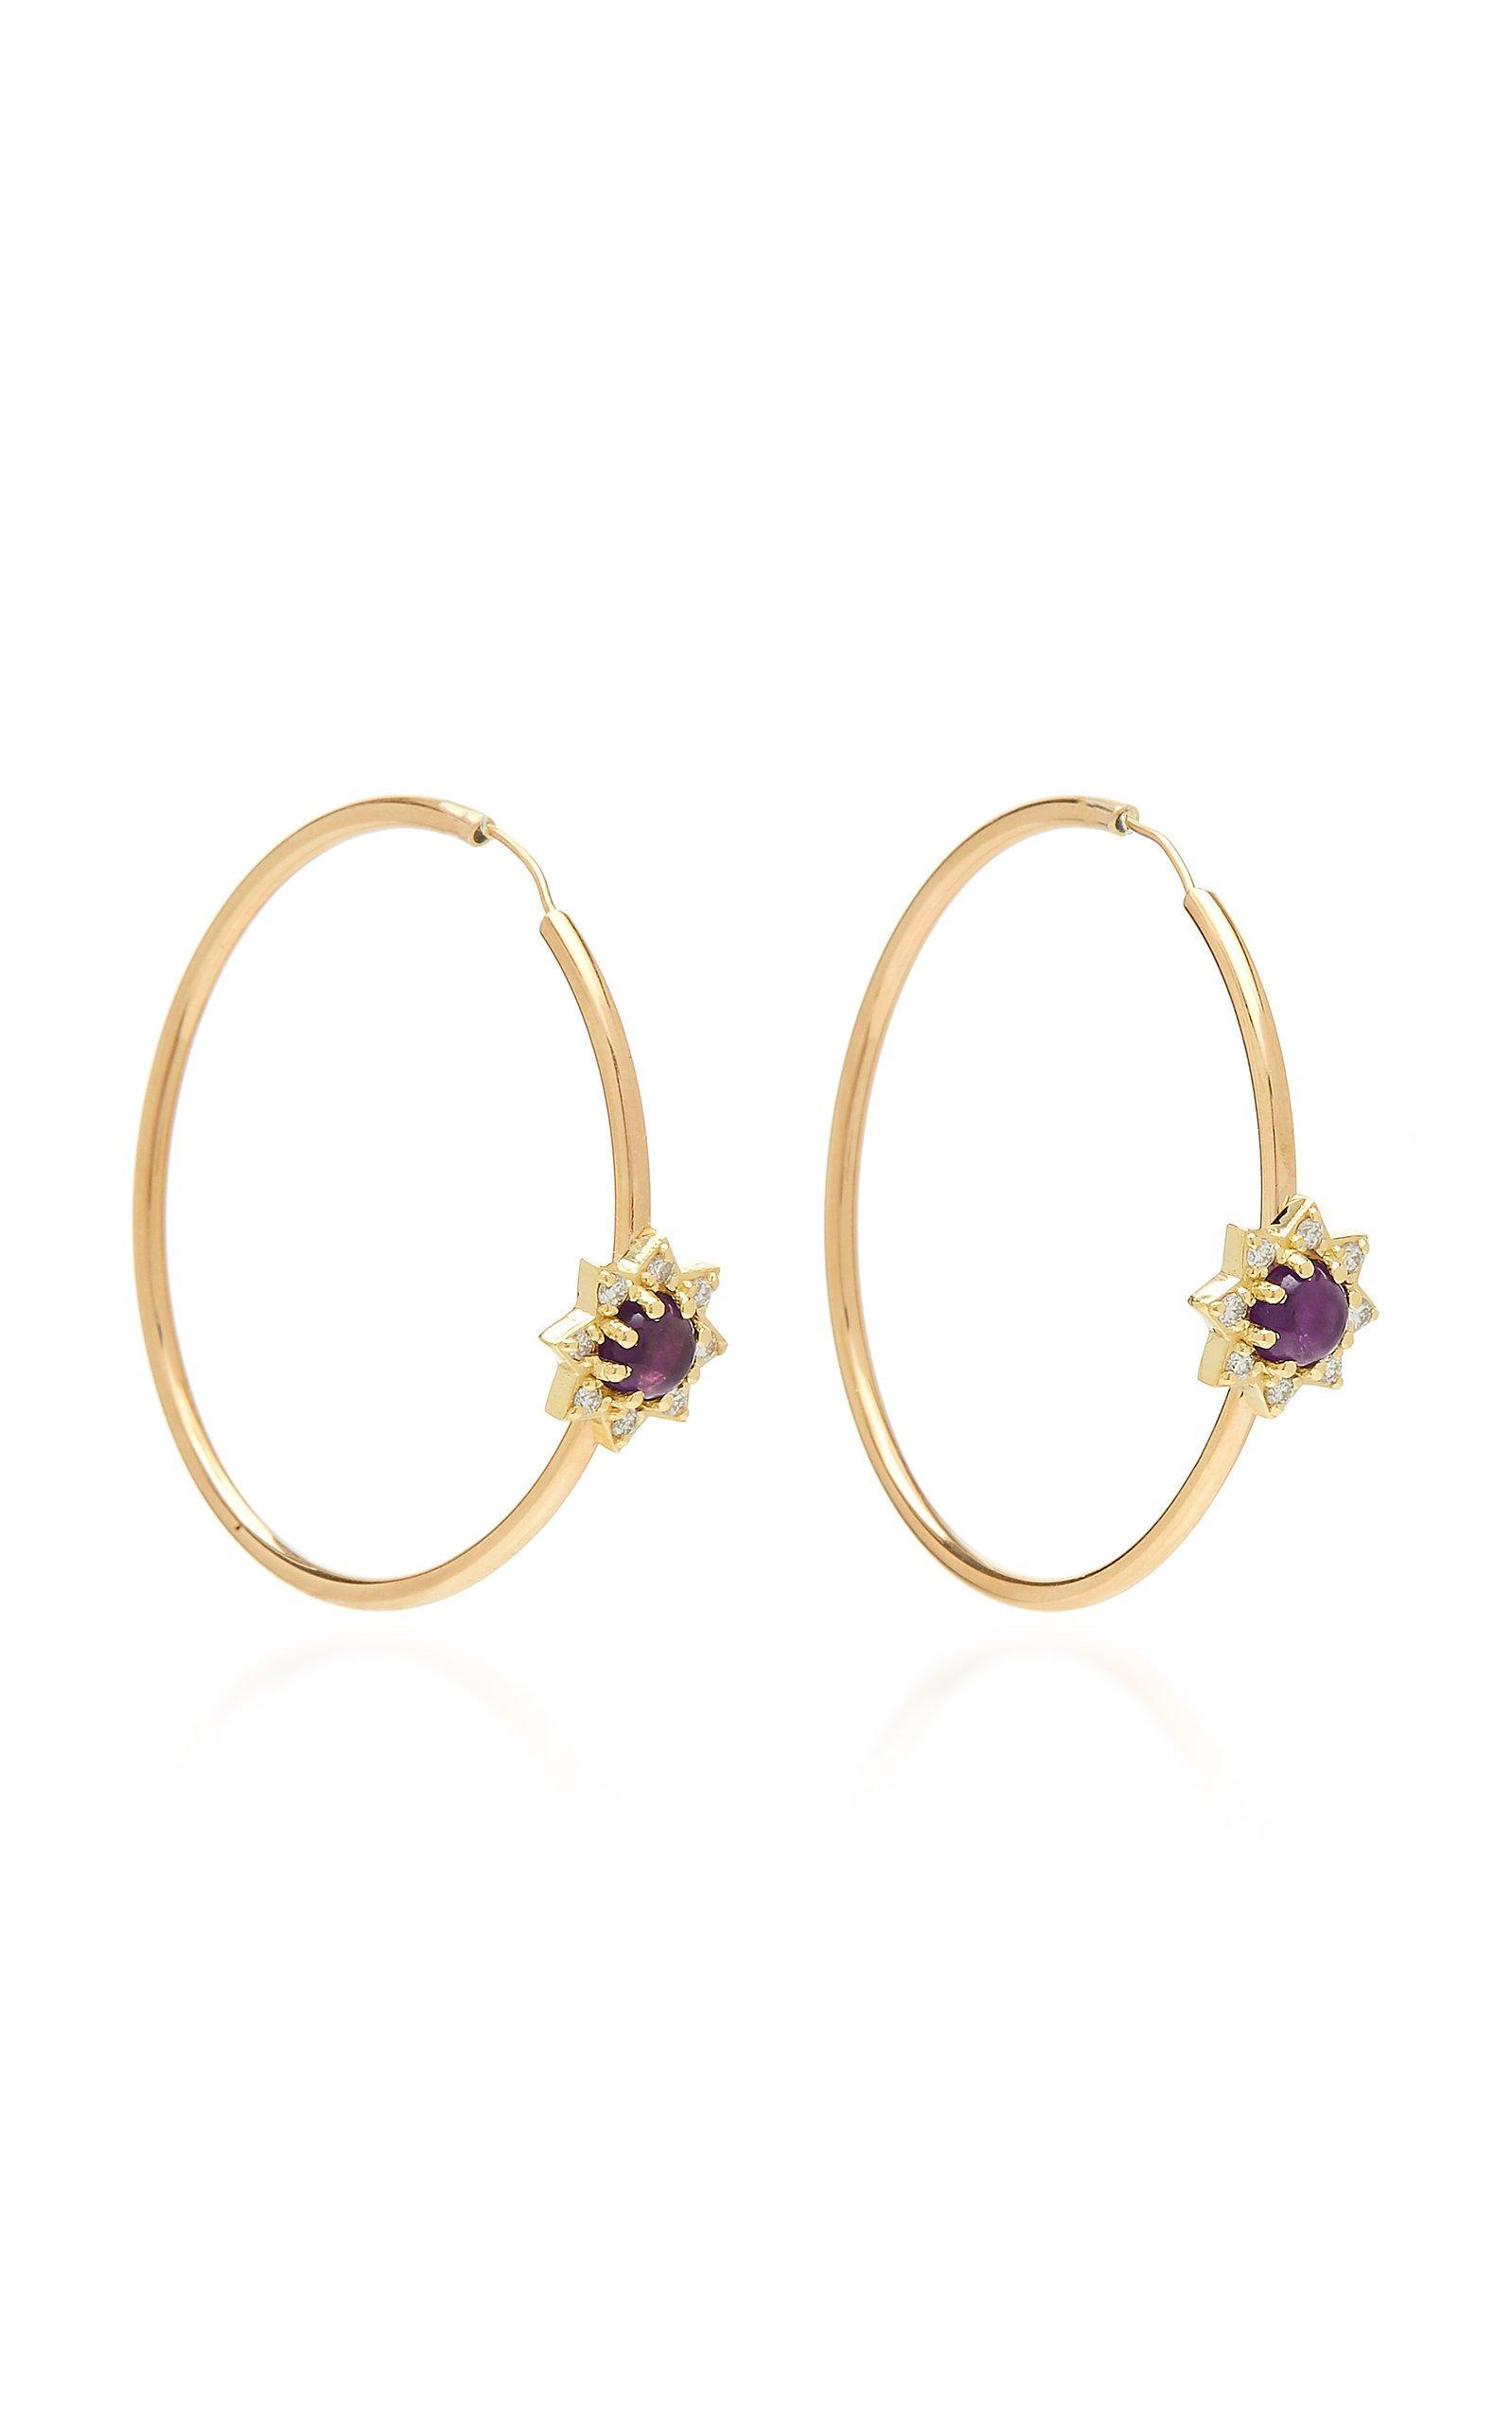 M.Spalten 18K Gold Amethyst And Diamond Earrings